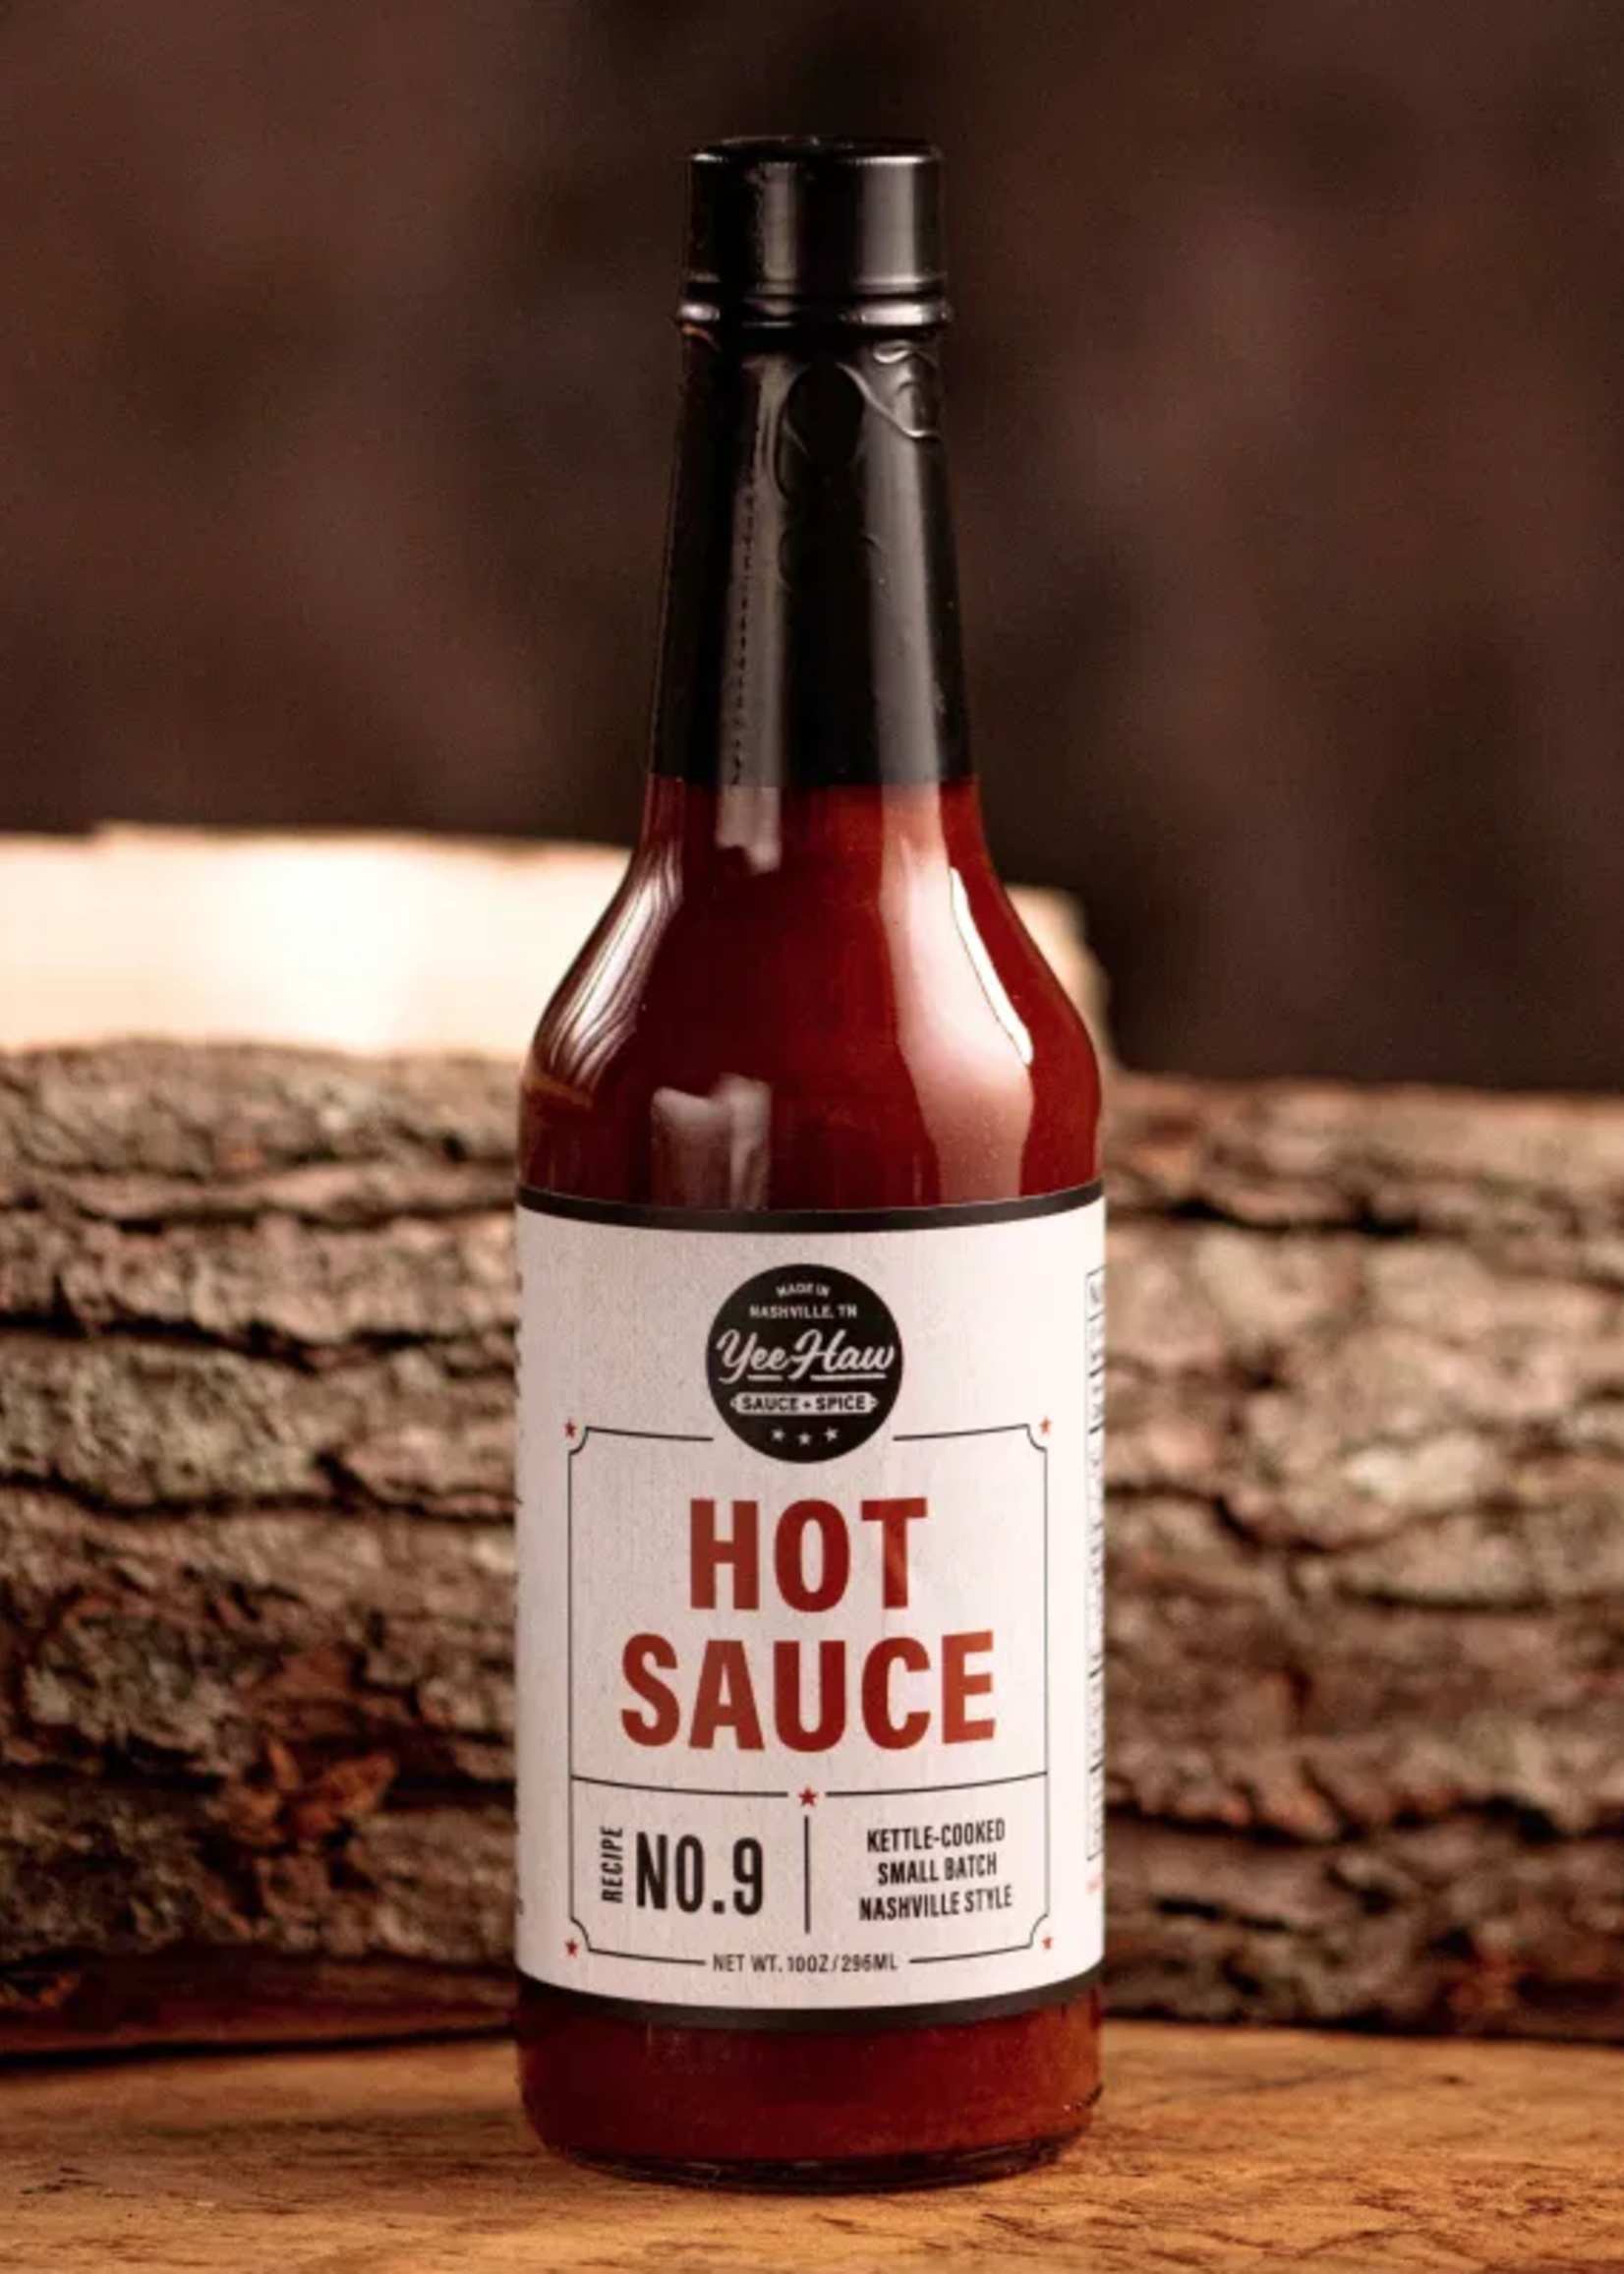 Yee Haw Sauce + Spice Red Hot Sauce - 10 oz